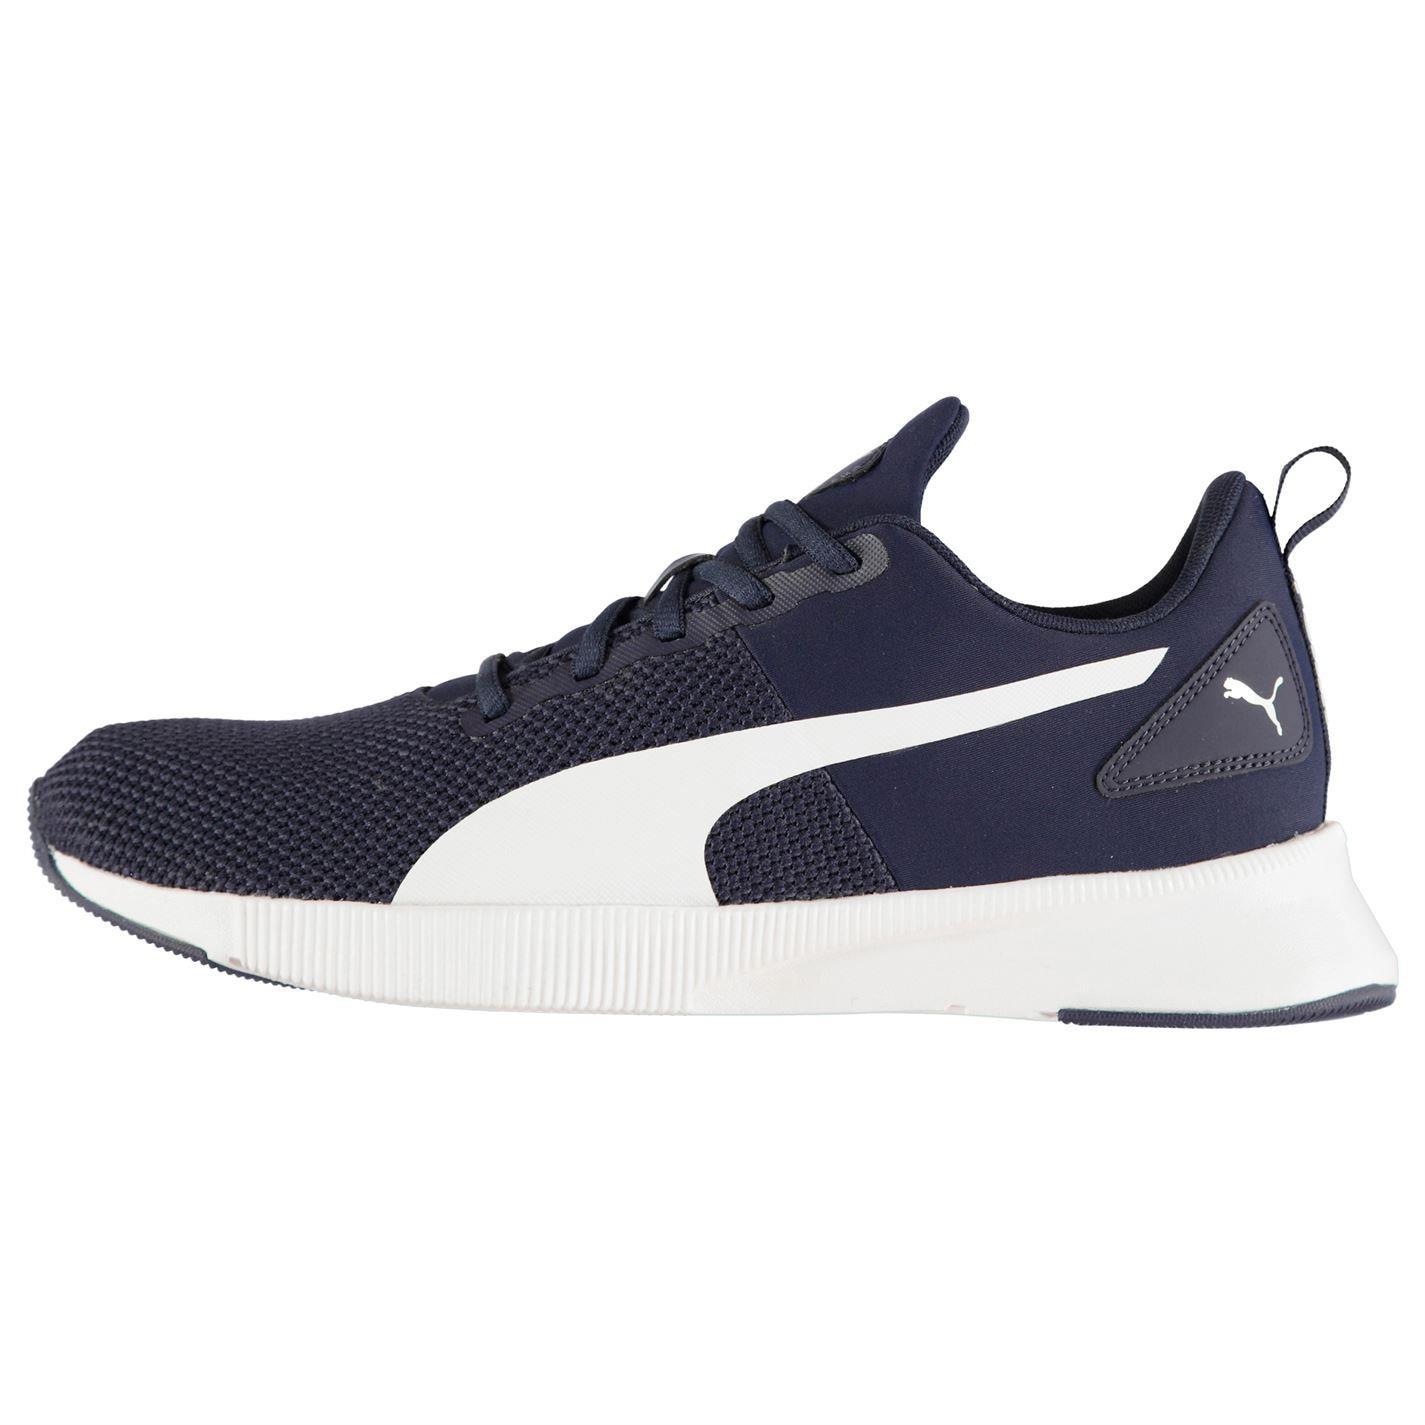 Puma Flyer Runner Mens Running Shoes UK